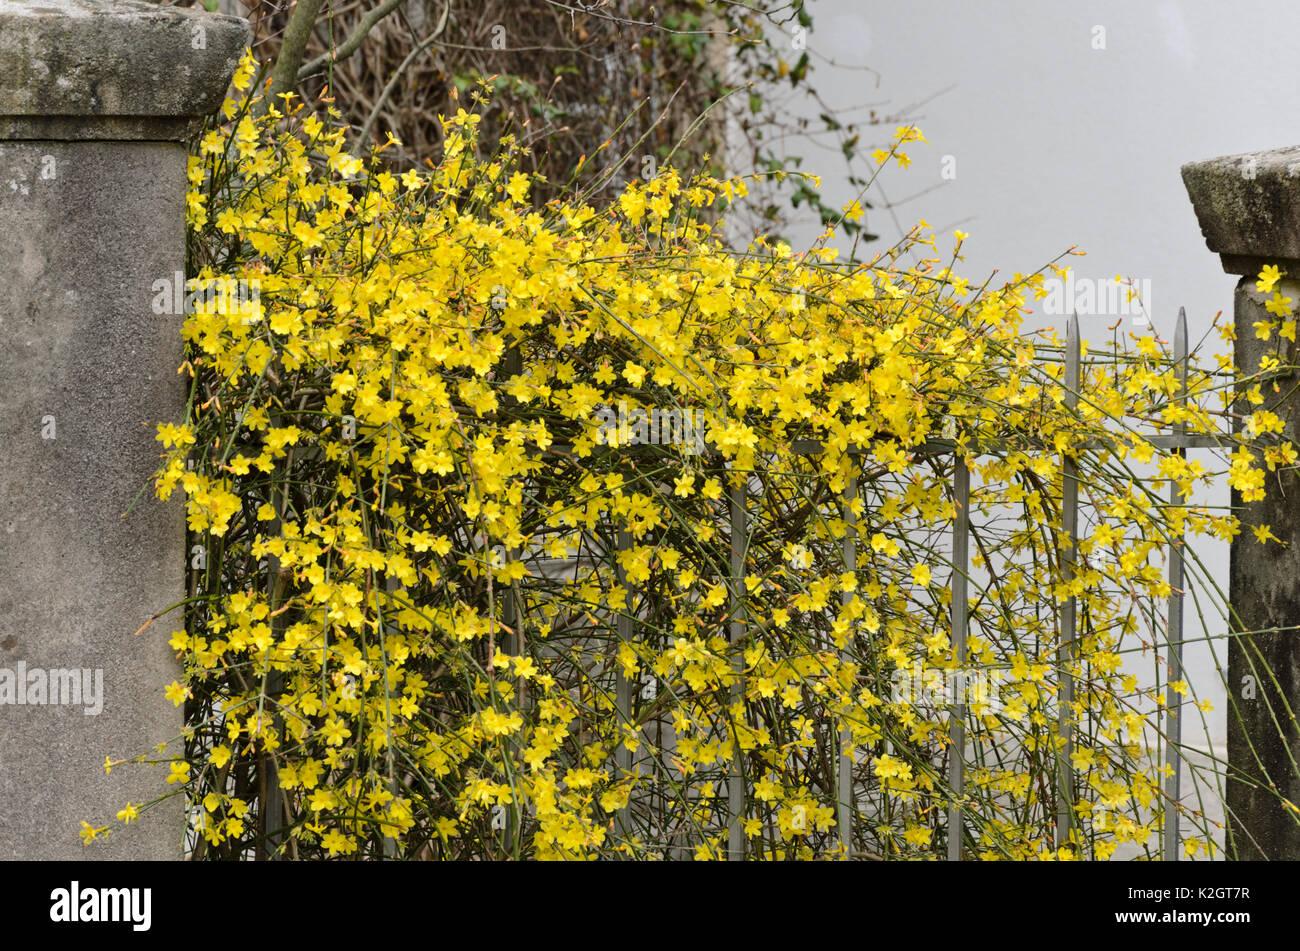 flowers of jasminum nudiflorum stock photos flowers of. Black Bedroom Furniture Sets. Home Design Ideas